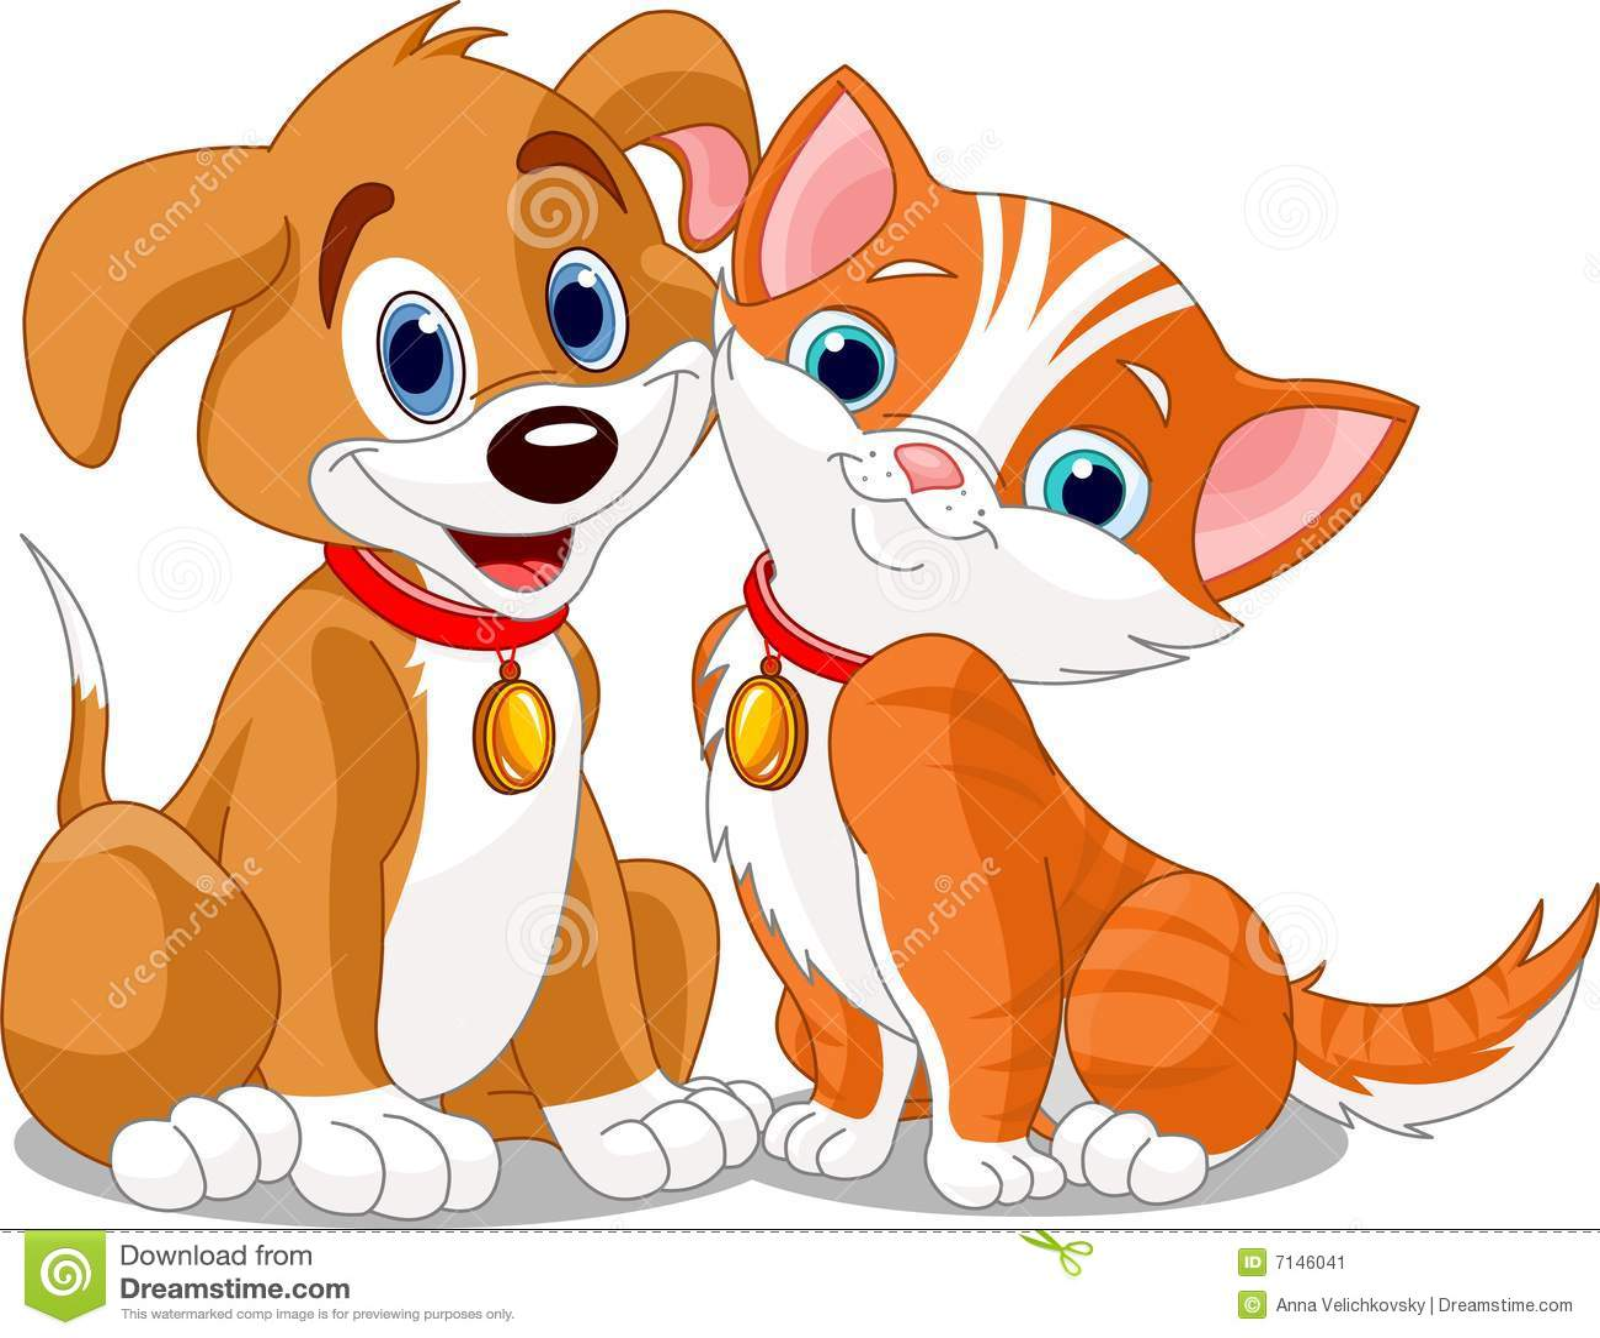 Cat_n_dog